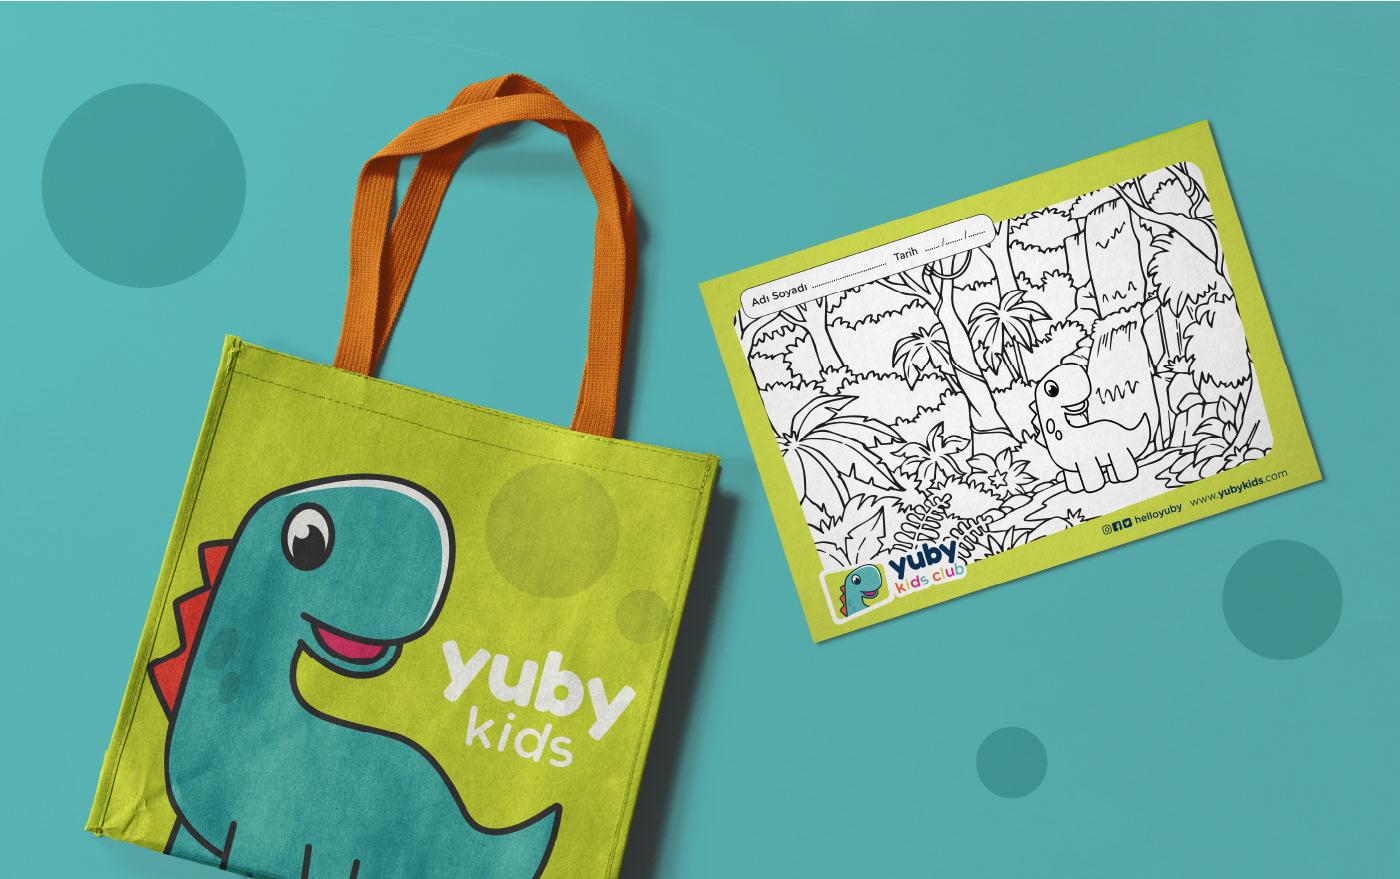 Image may contain: child art, cartoon and handwriting